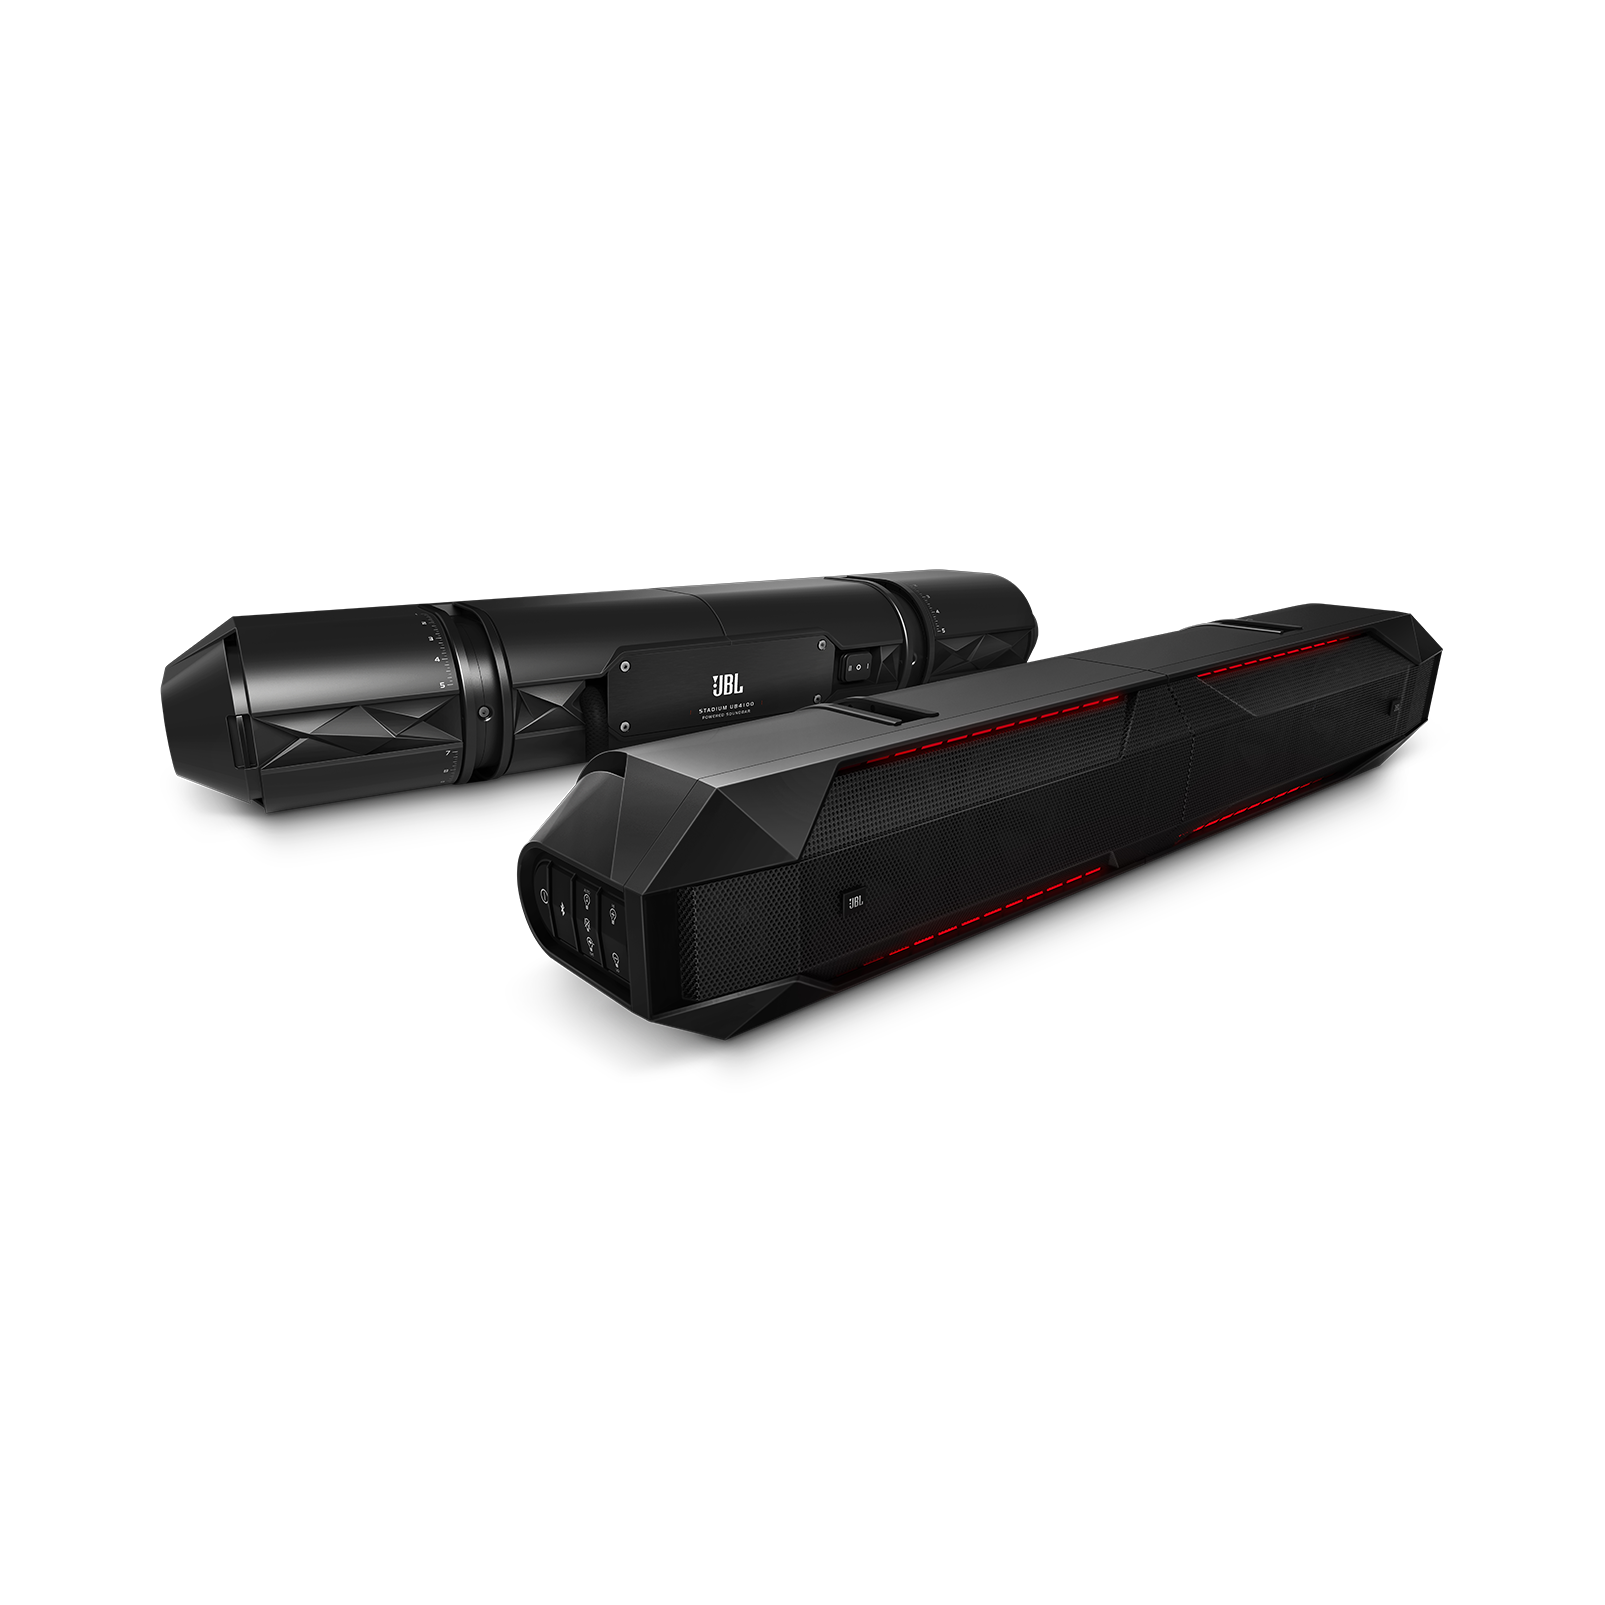 JBL Stadium UB4100 Powersports - Black - Weatherproof Full Range Speaker Pair, 240W - Hero